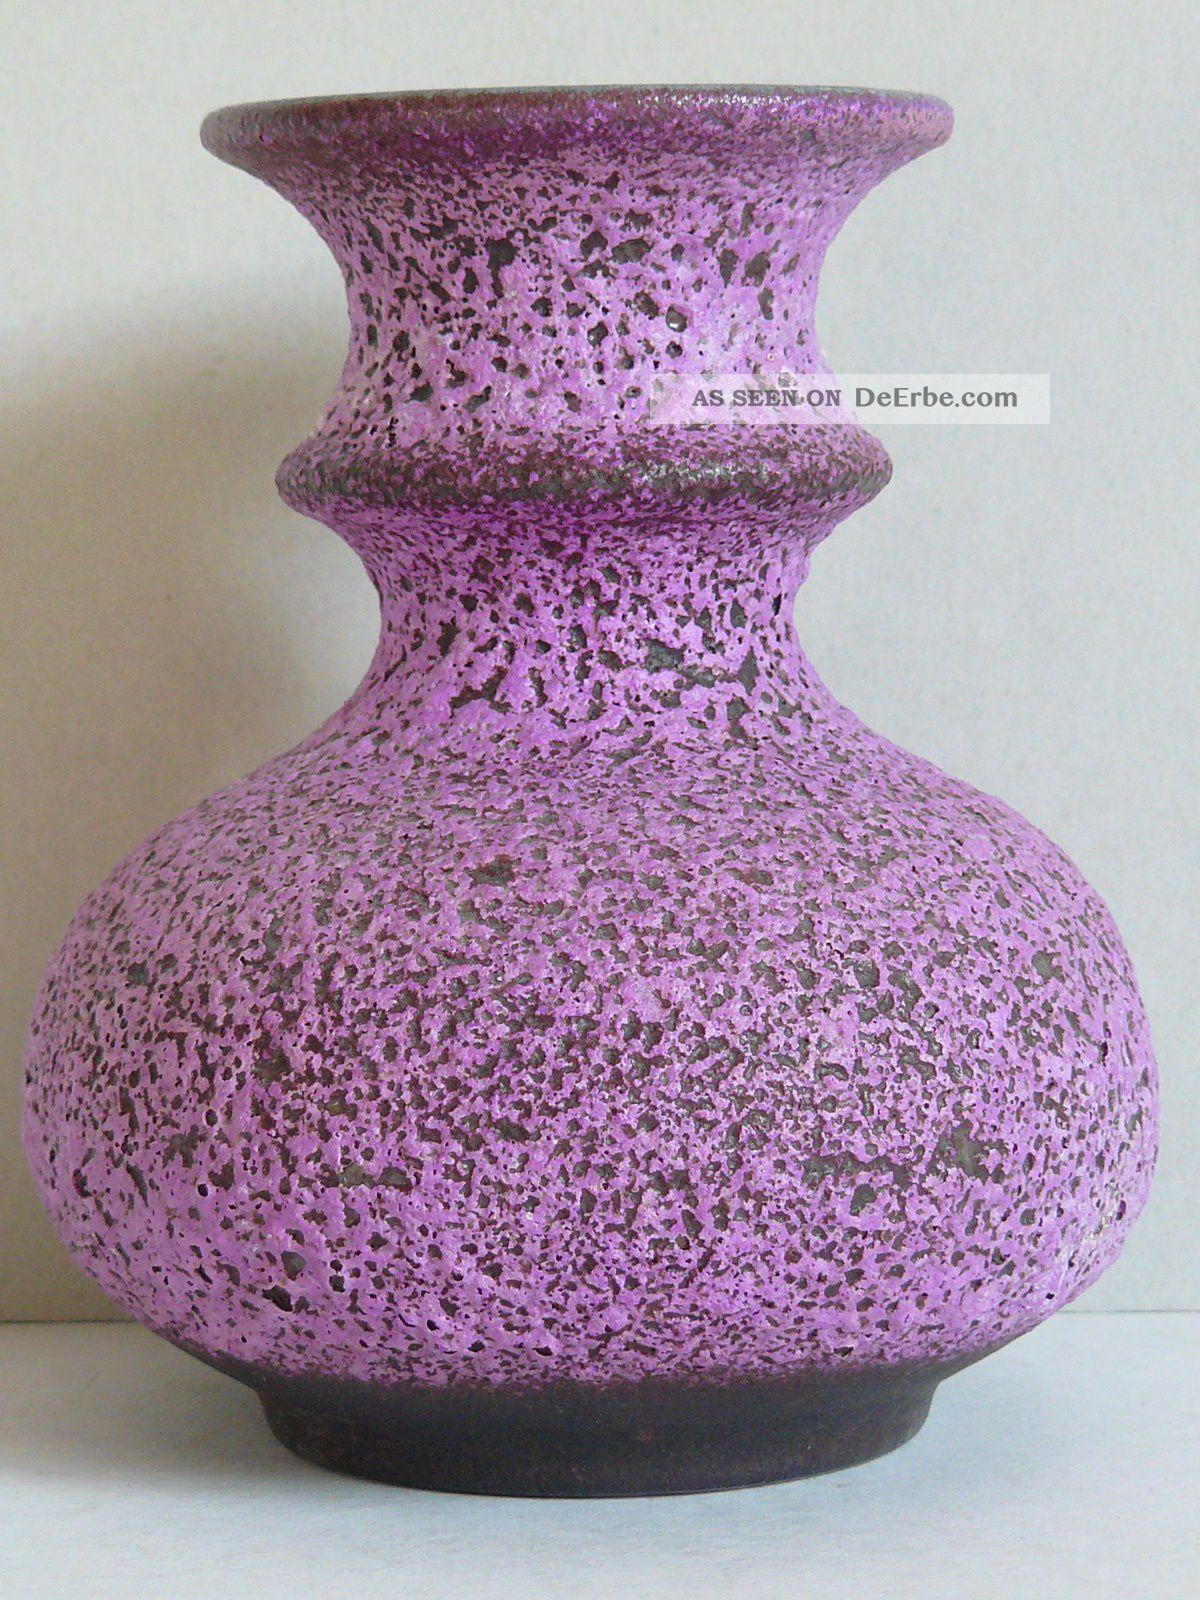 Steuler Keramik Vase Cari Zalloni Fat Lava Crusty Purple Glaze 223/15 1970-1979 Bild